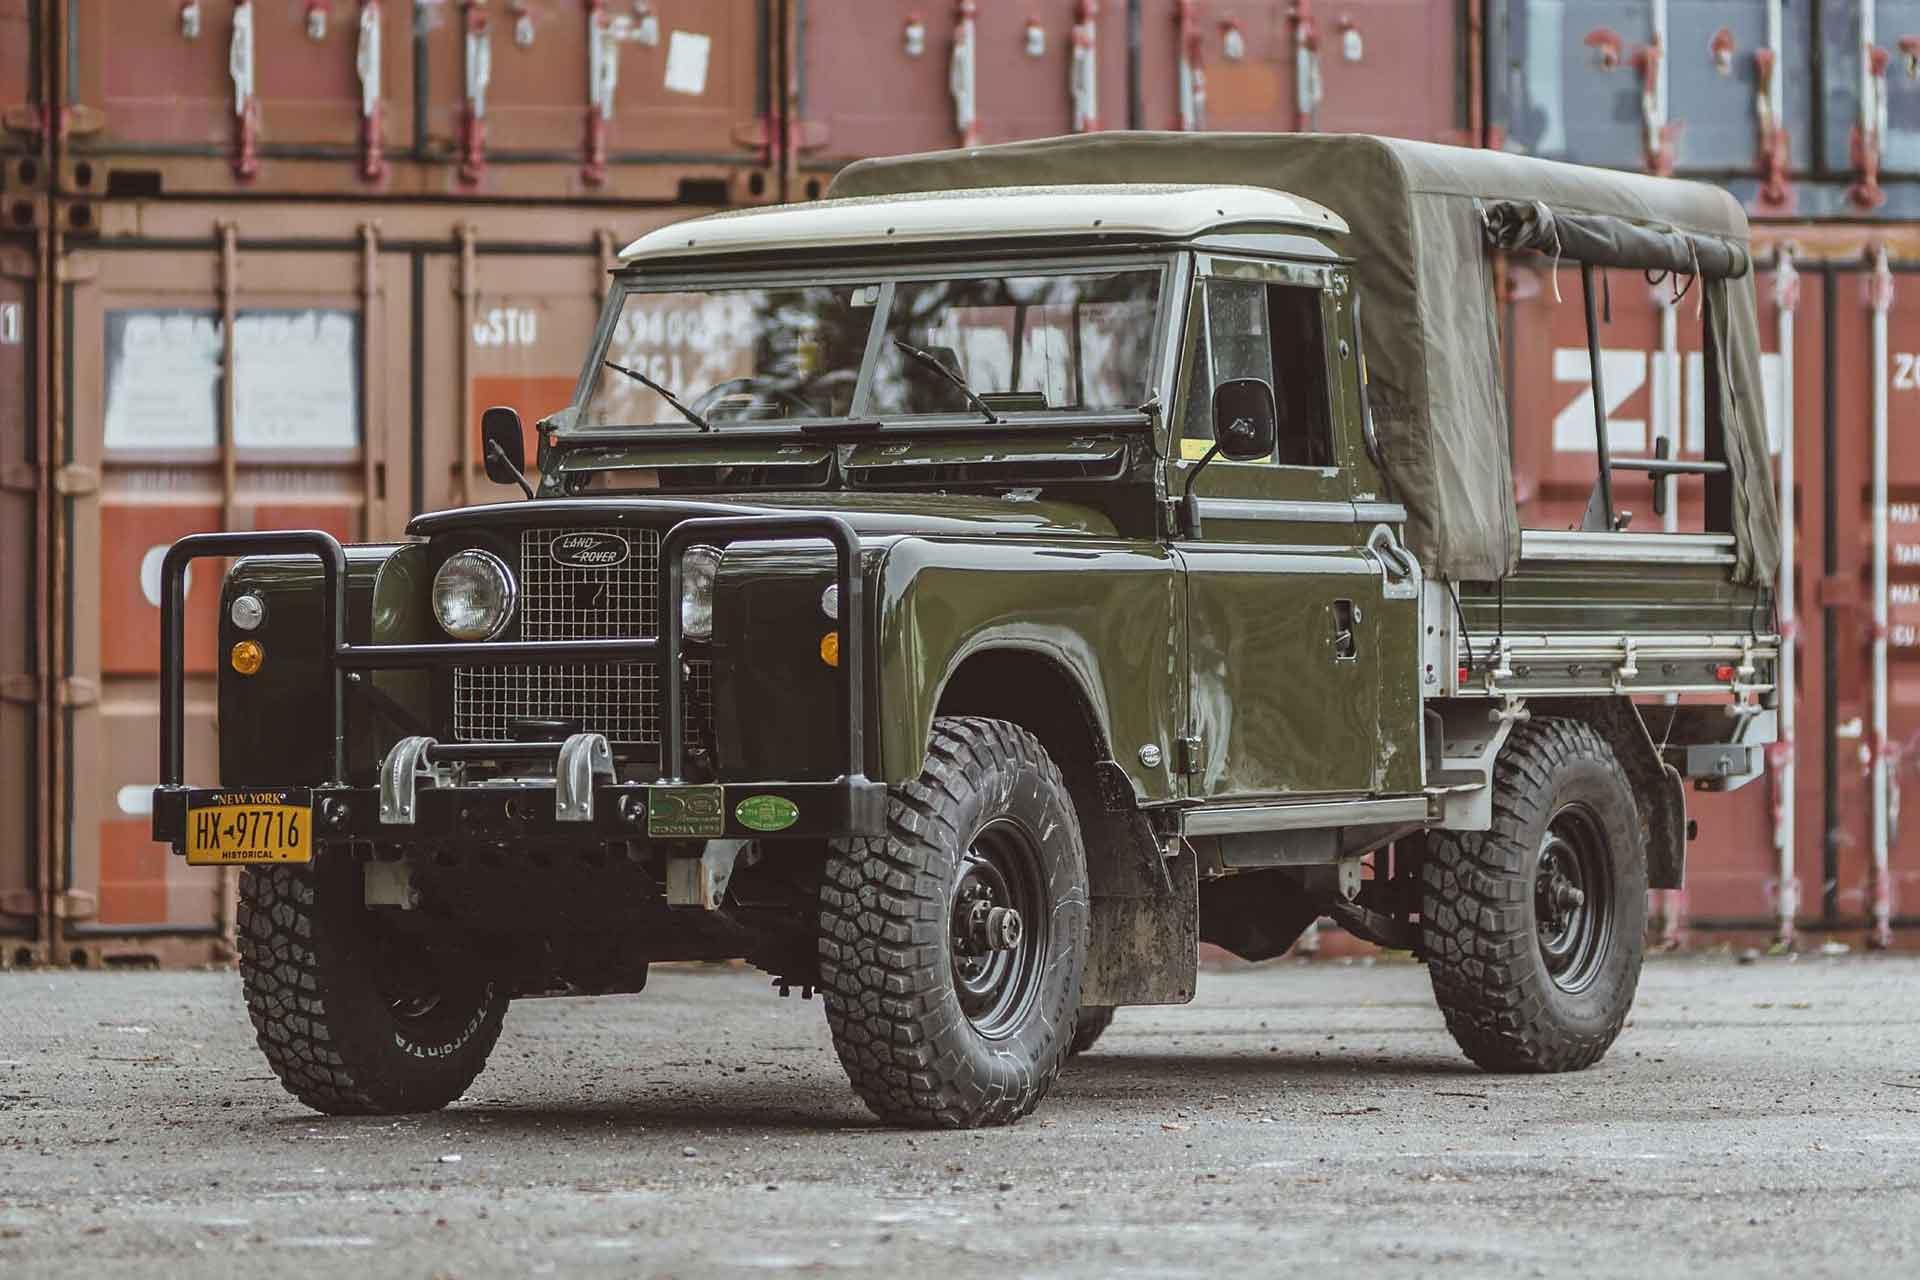 1958 Land Rover Series II Truck